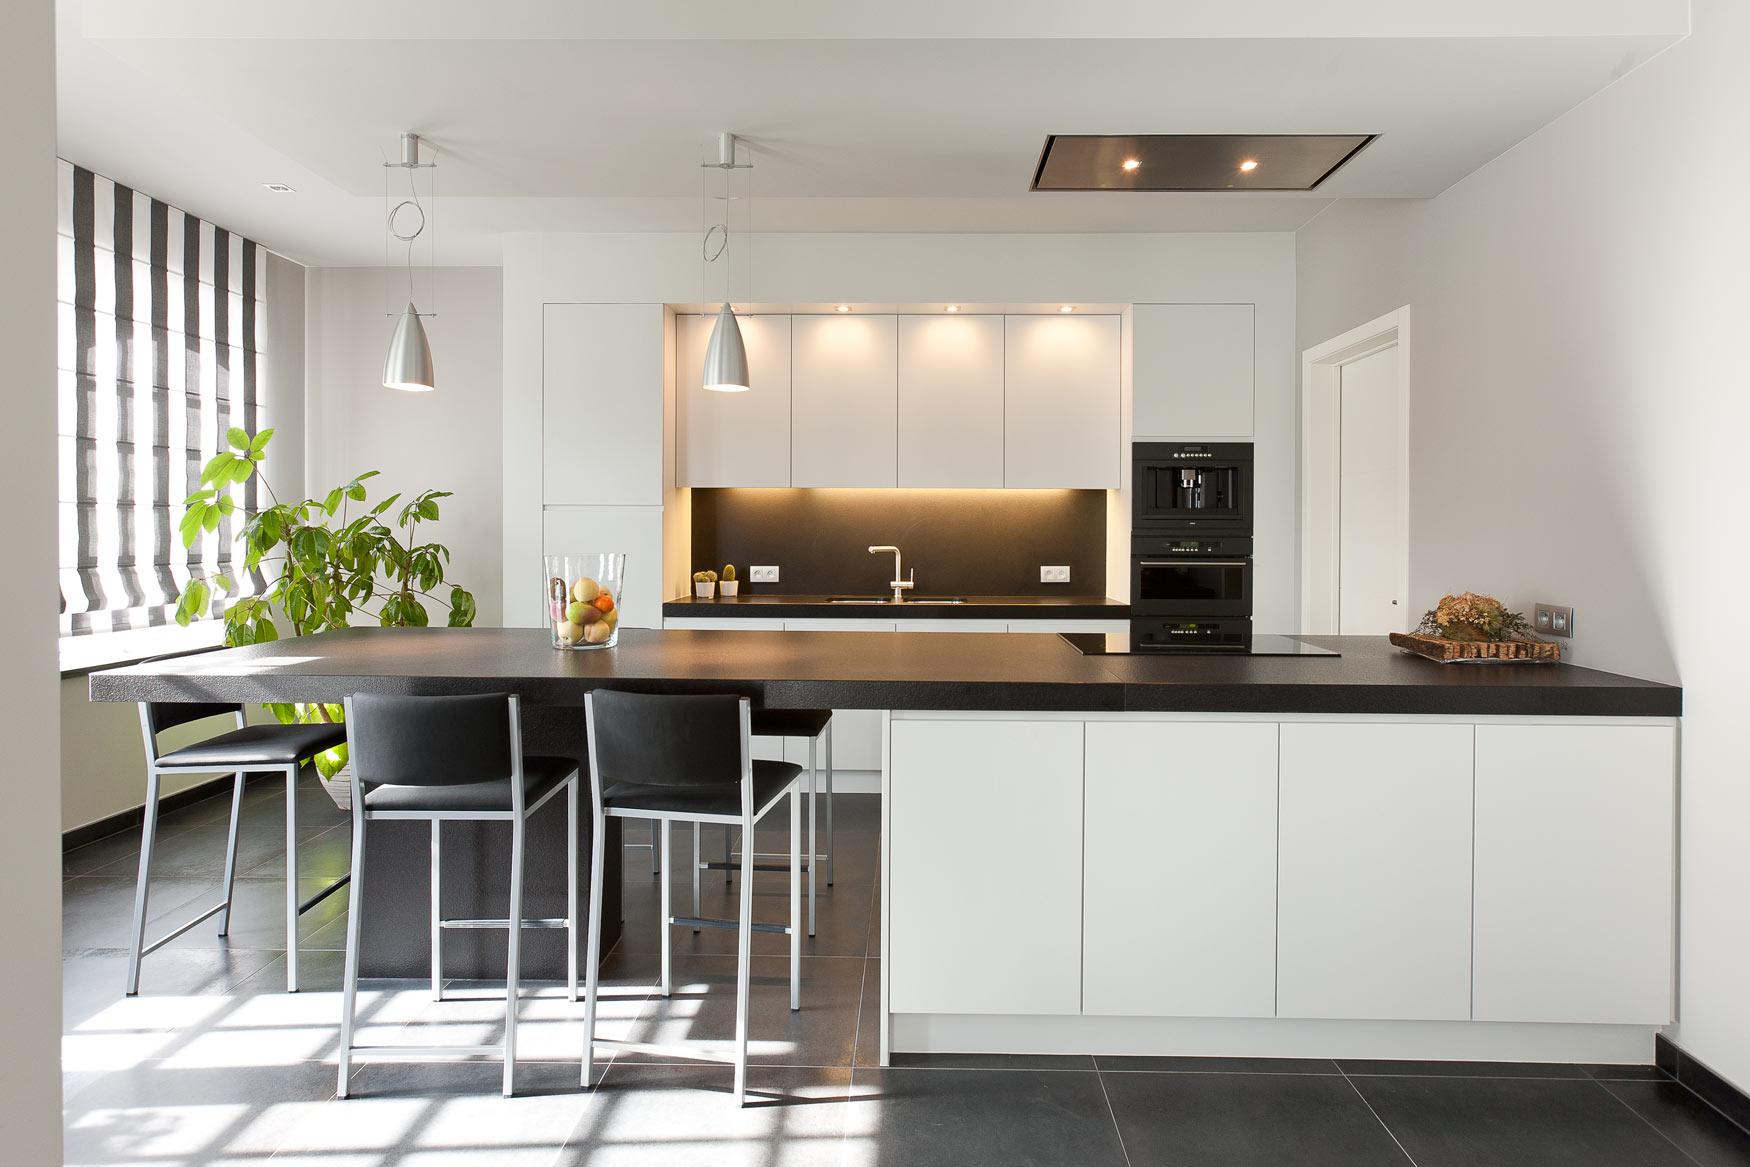 Achterwand Modern Keuken : Moderne keuken achterwand in nieuw collecties van moderne keuken